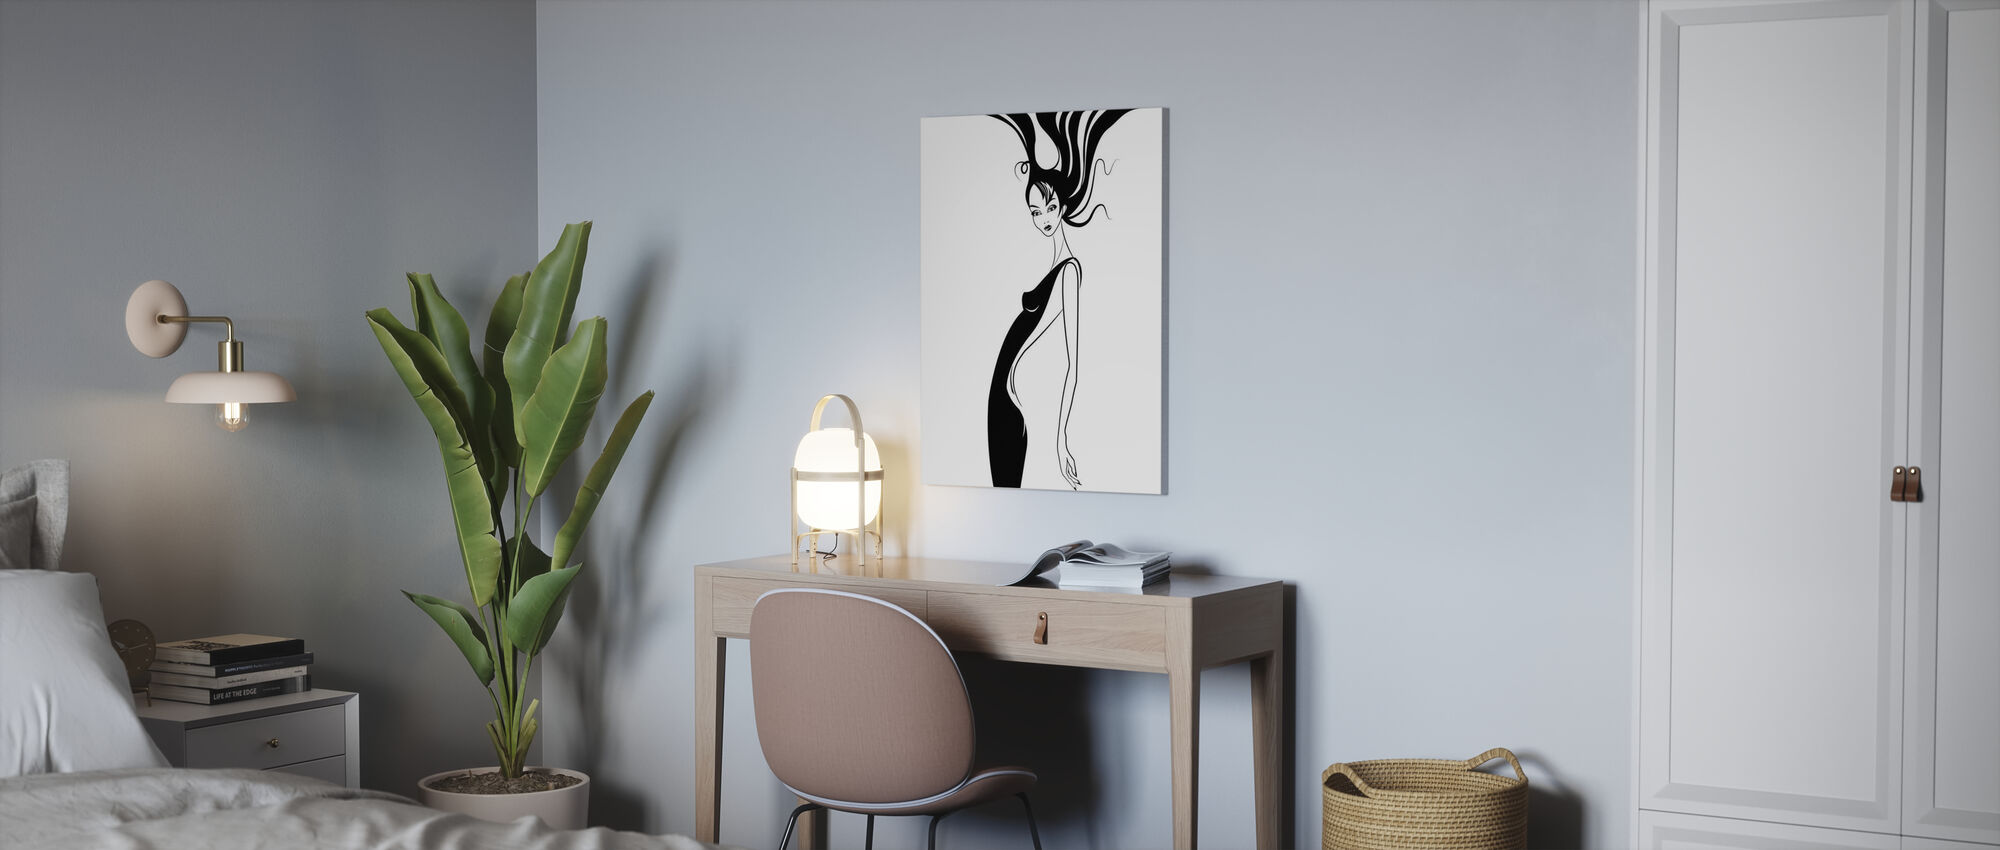 Retro Glamour - Impression sur toile - Bureau